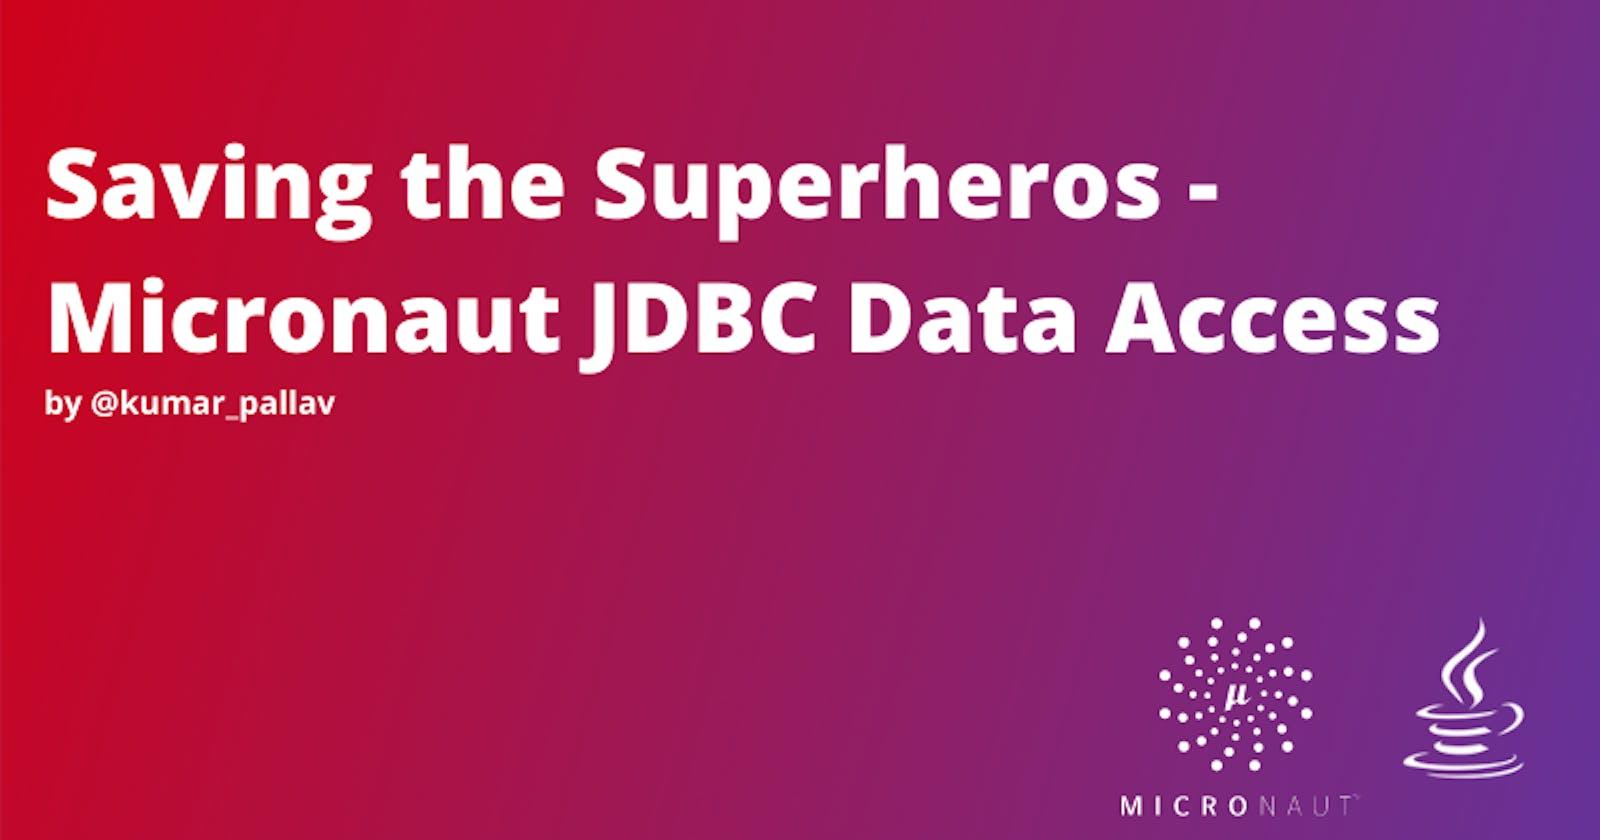 Saving the Superheros - Micronaut JDBC Data Access